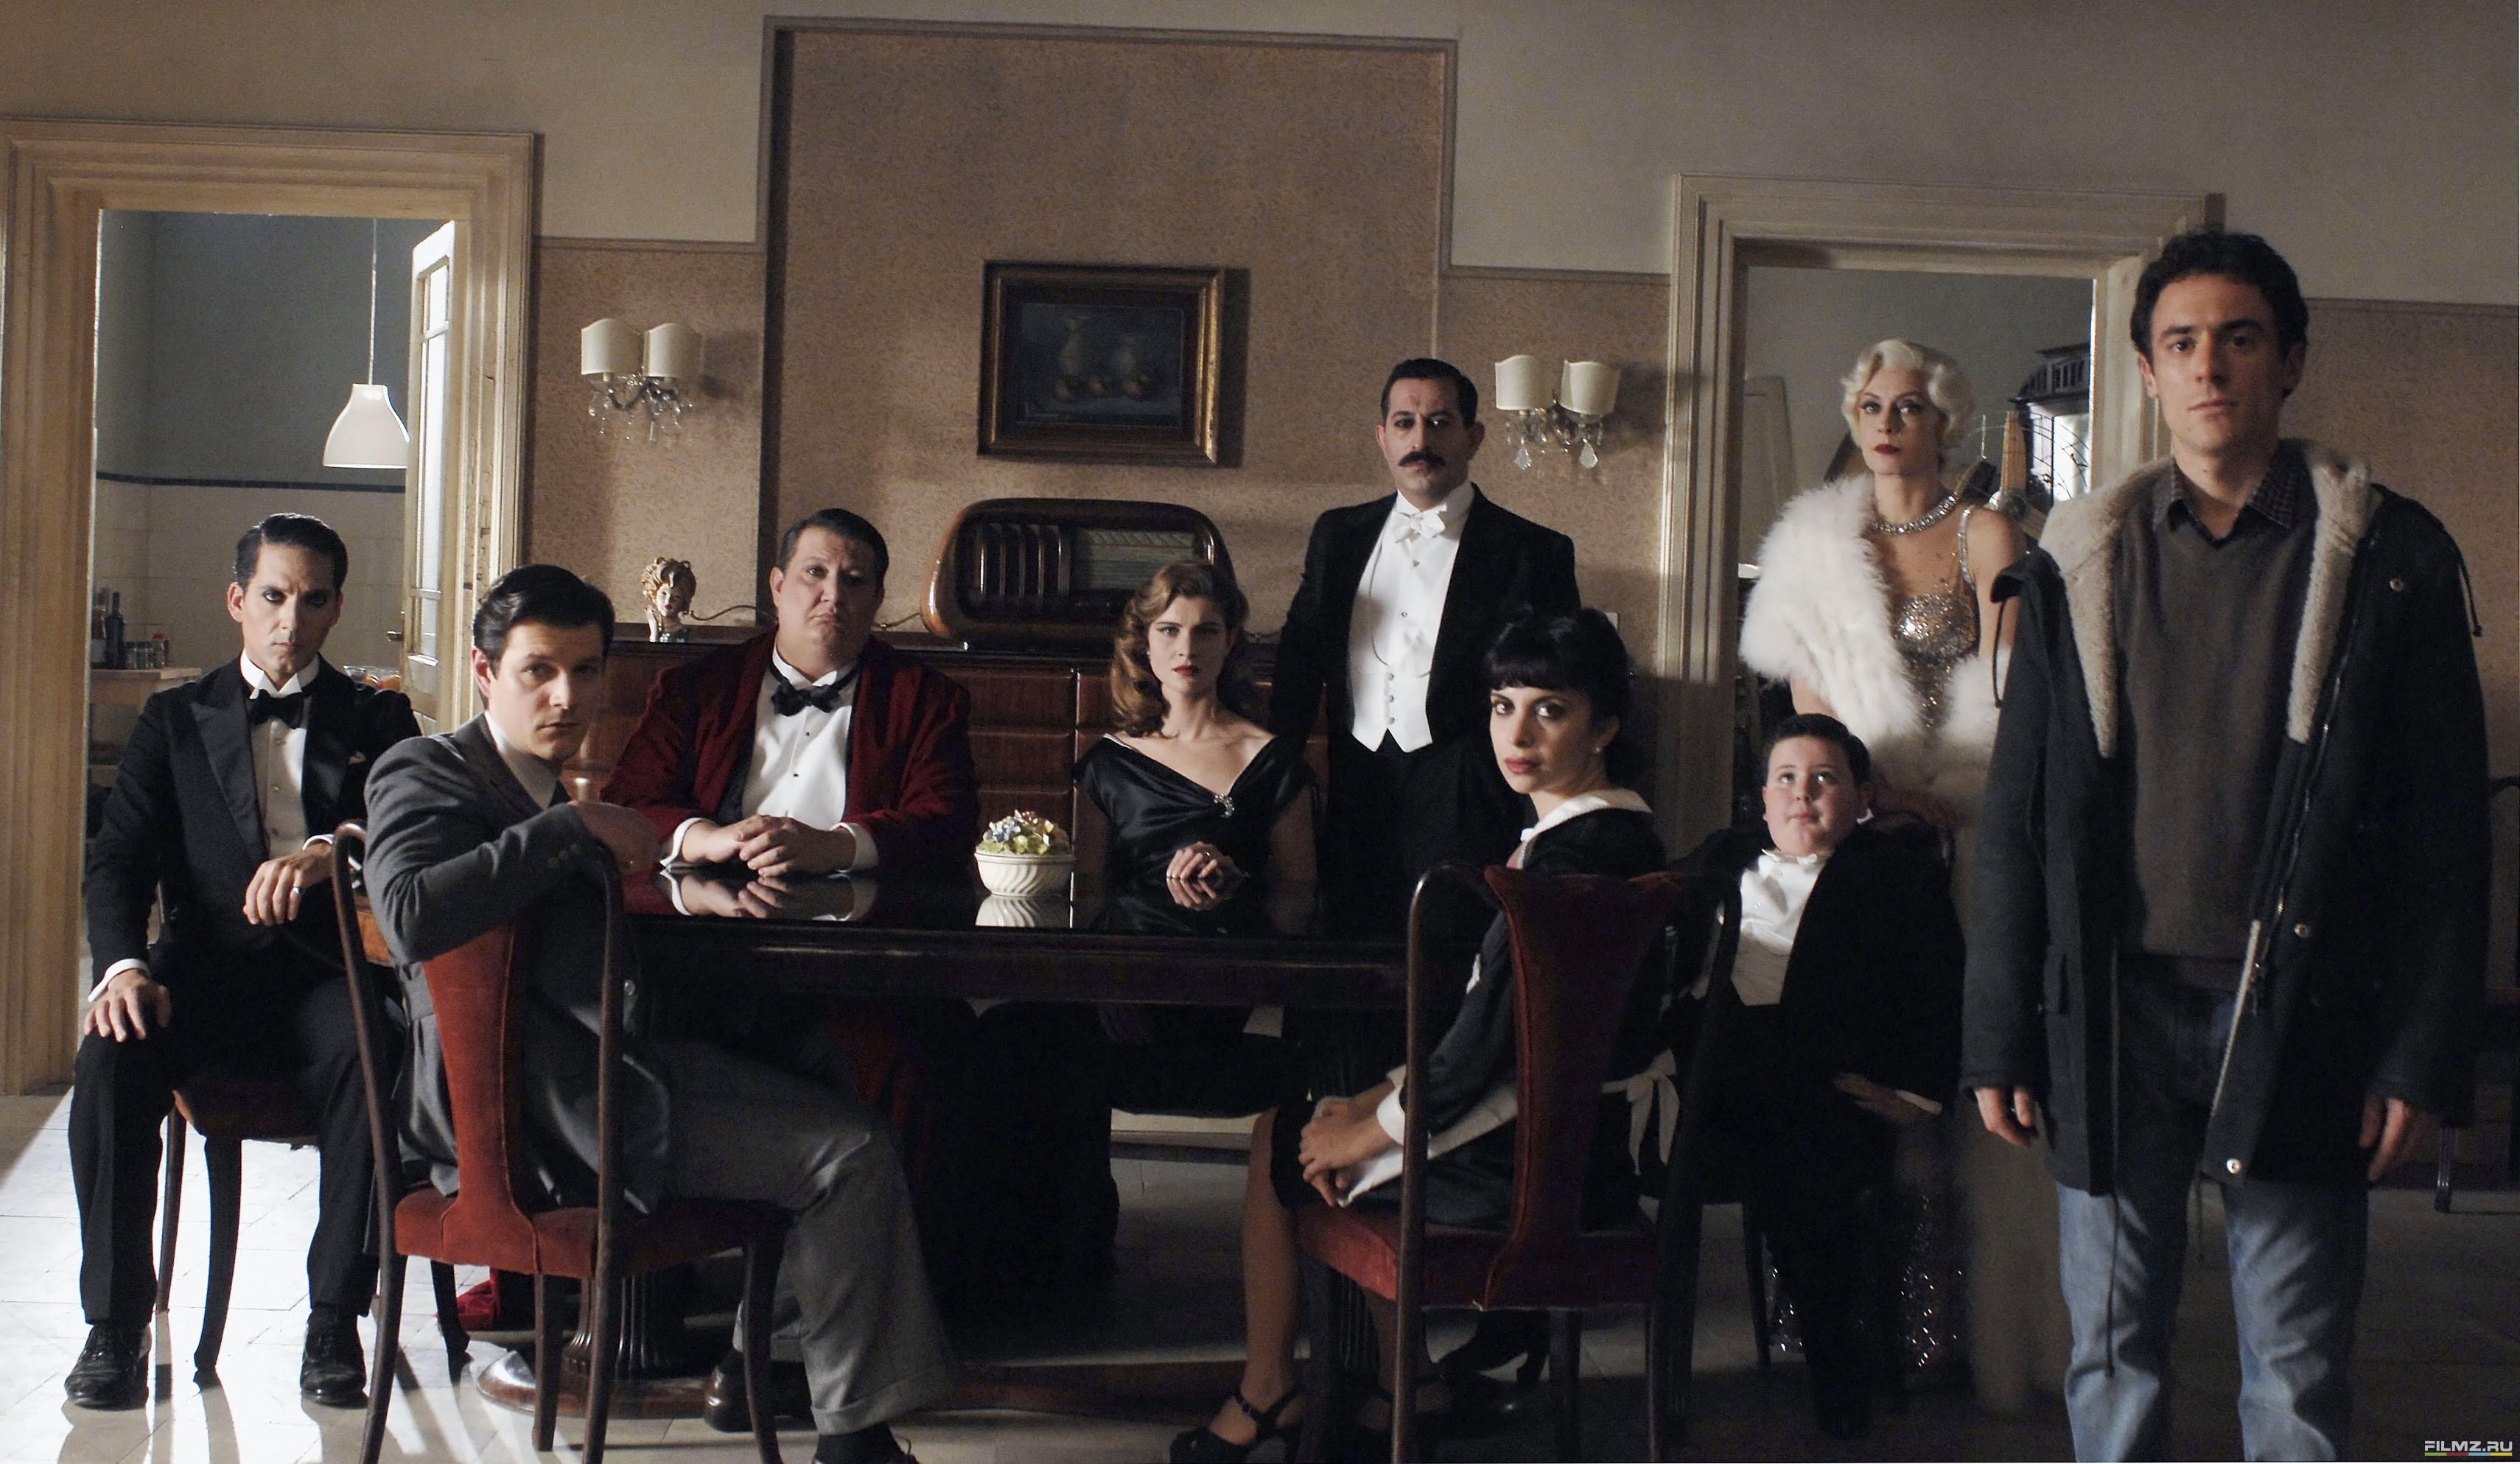 со съемок Присутствие великолепия Маргерита Буи, Андреа Боска, Элио Джермано, Виттория Пуччини,